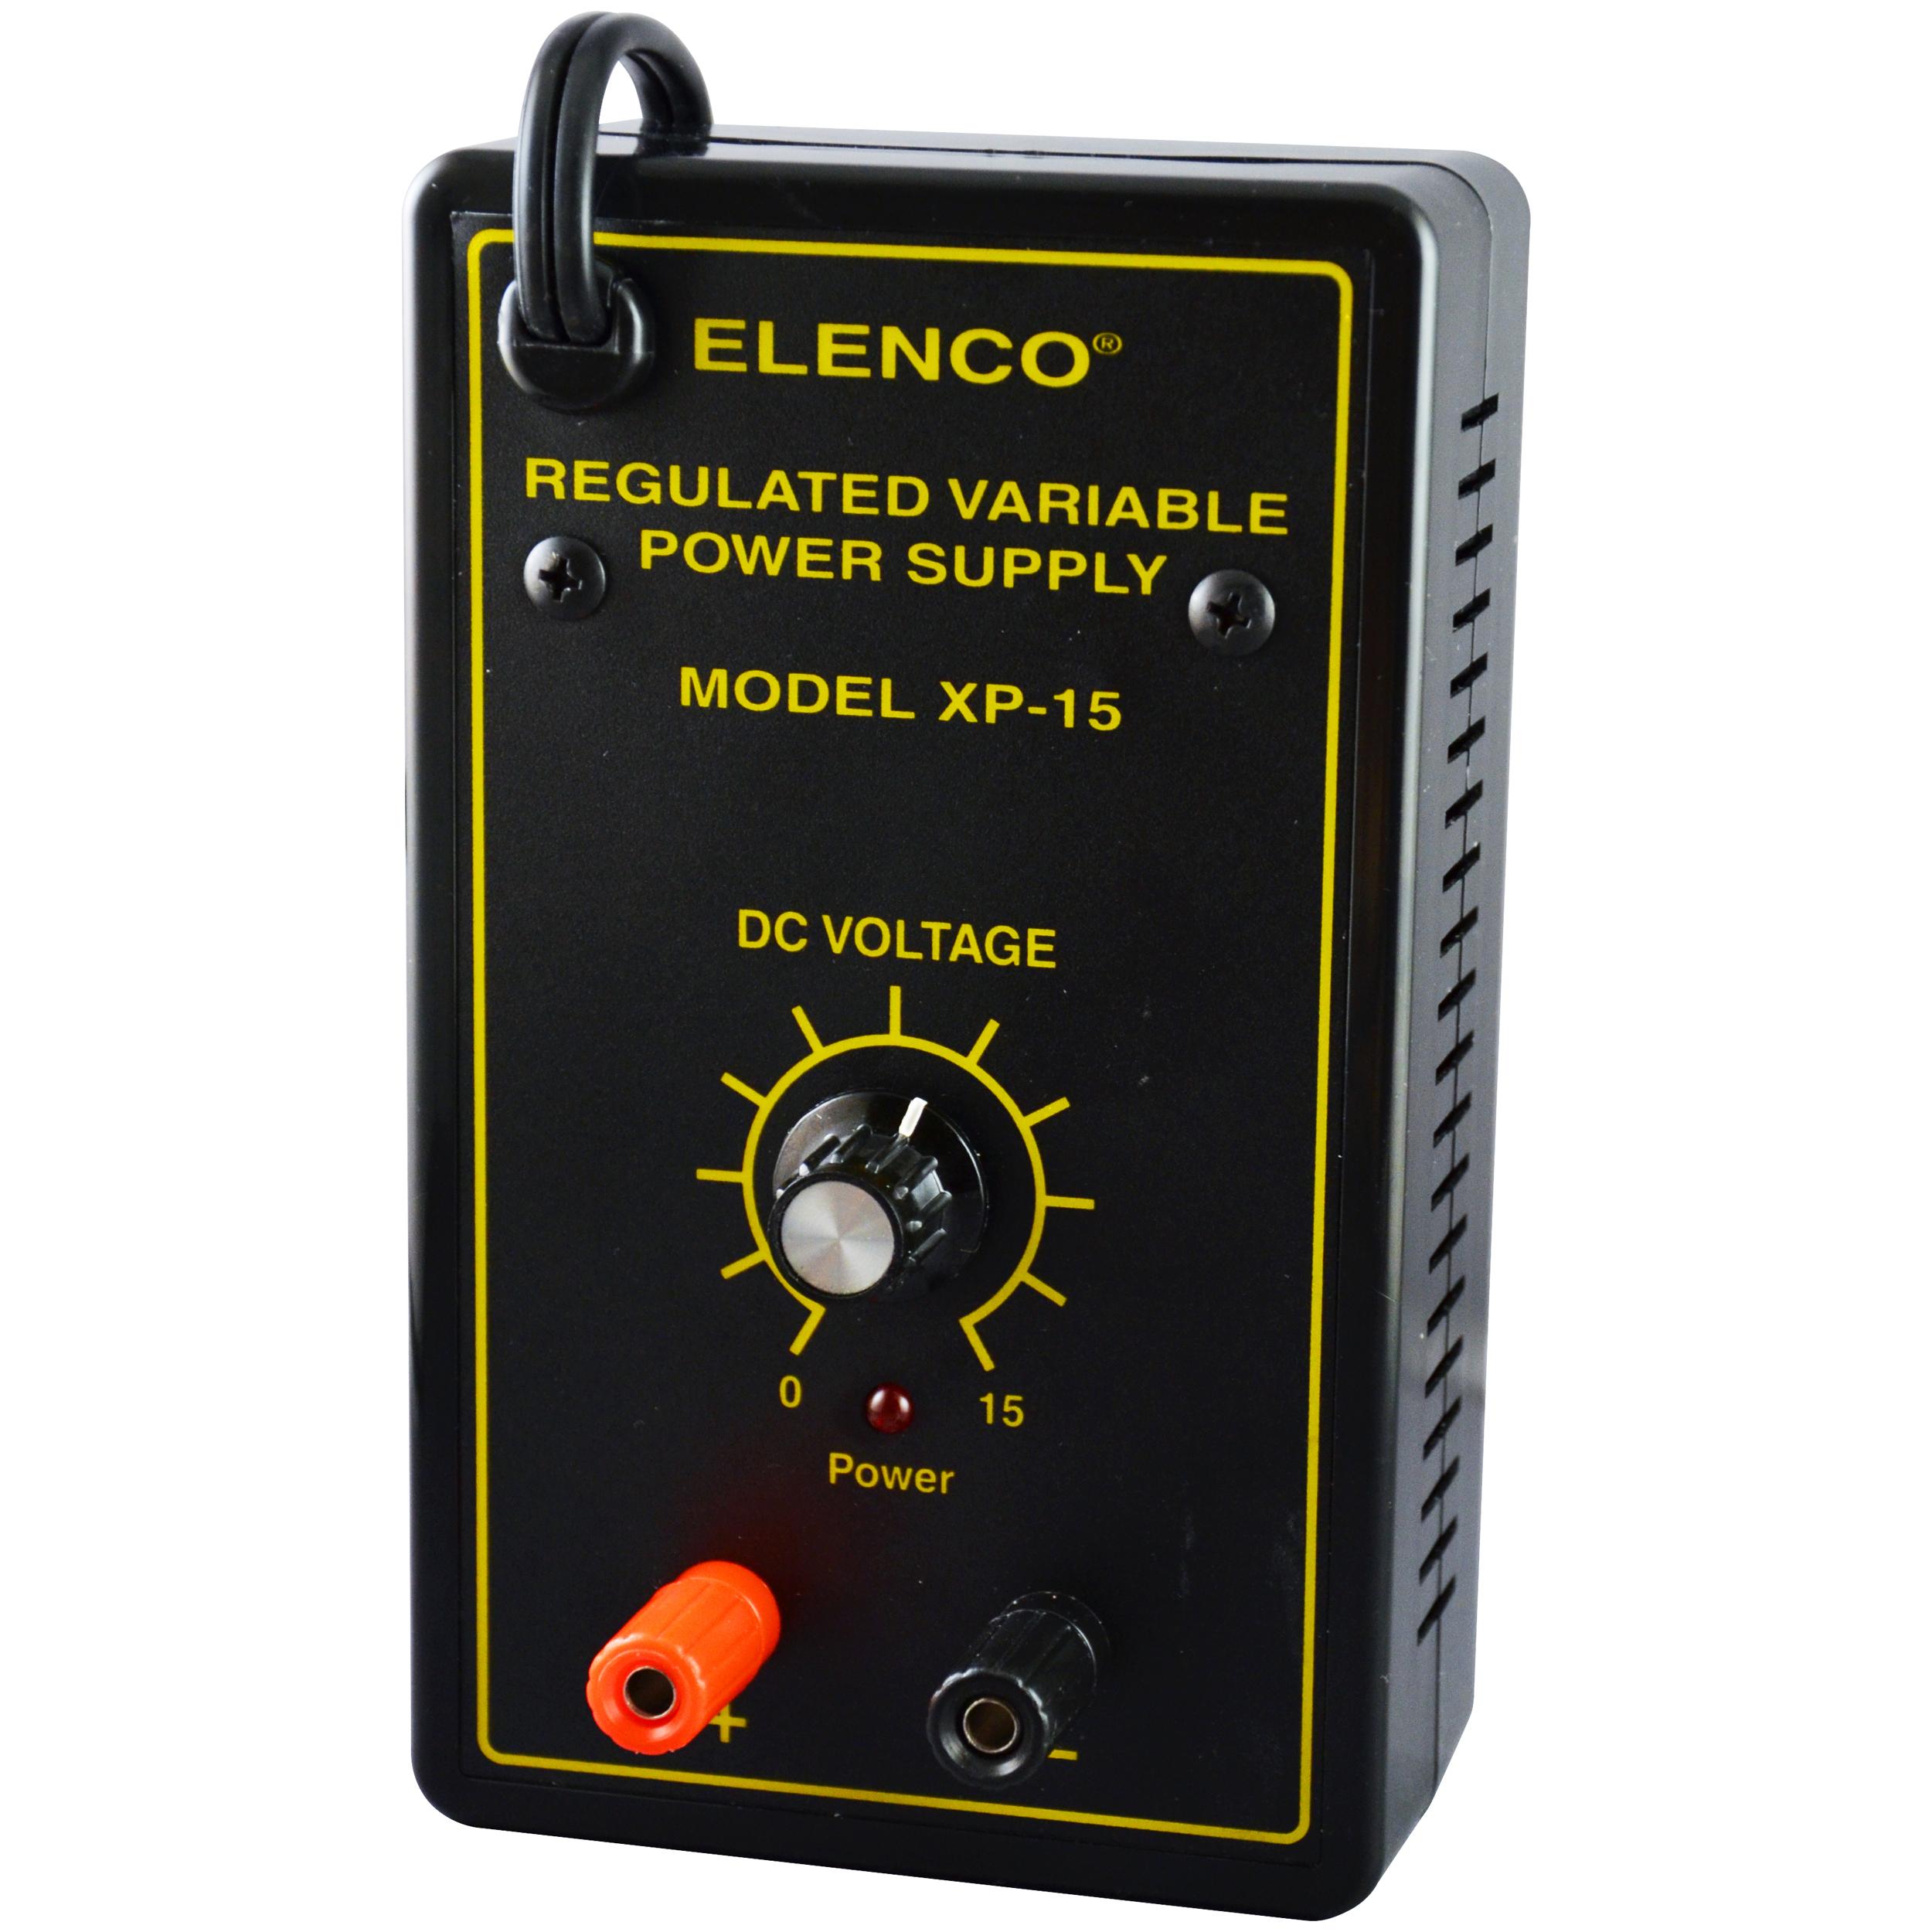 Supply Variable 0 1v To 50v Power Isolated Ac Voltage Spans 0vac 280vac Powersupplycircuit Elenco Kit Electronic Kits